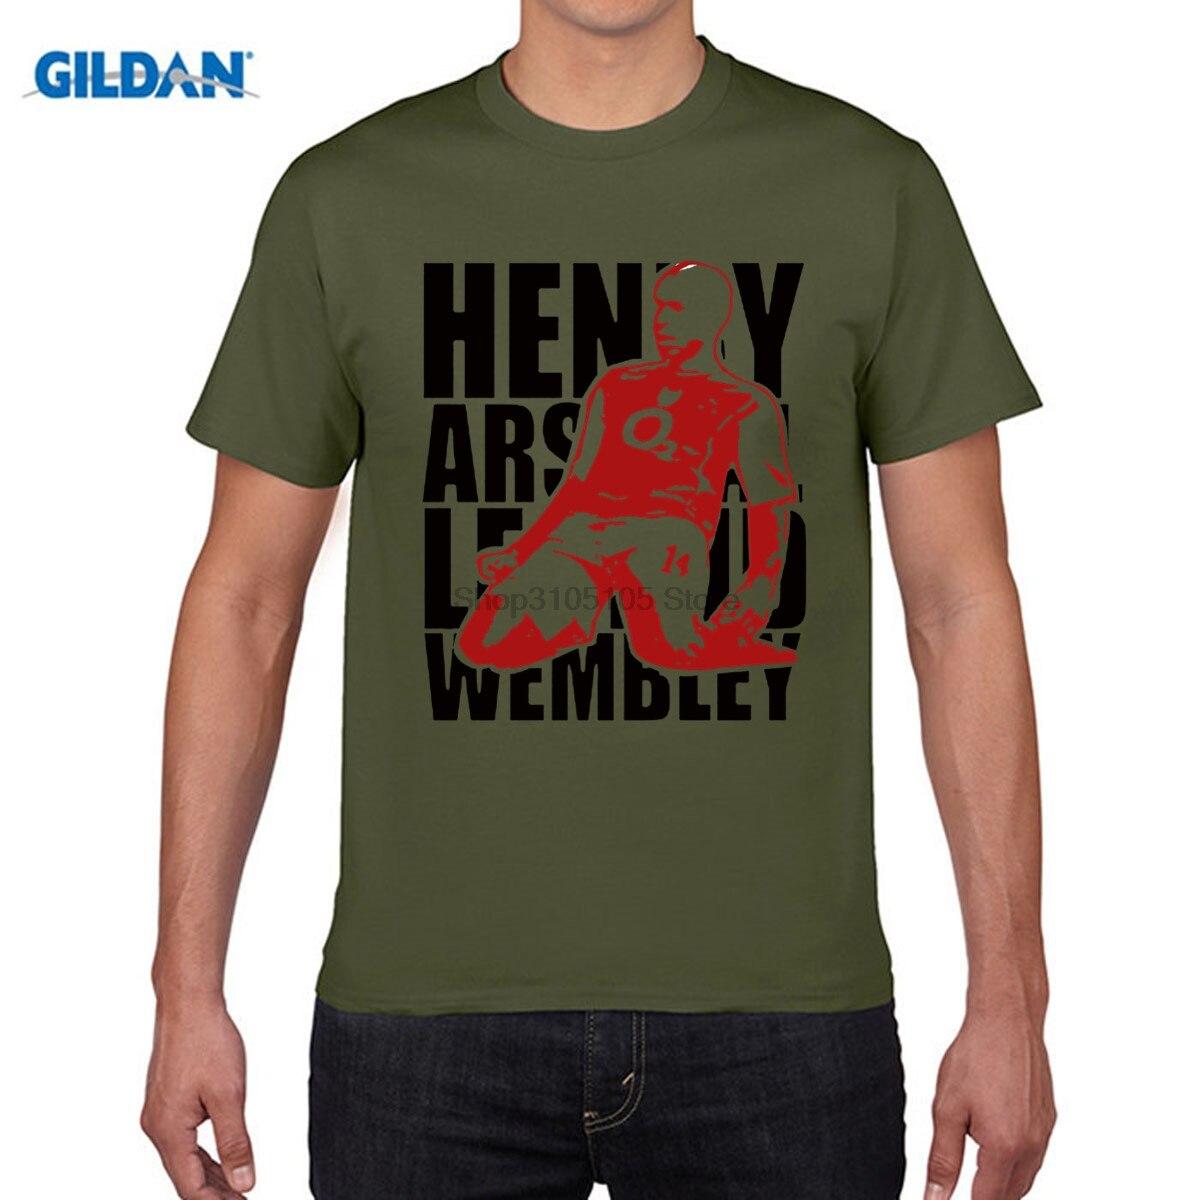 GILDAN funny men t shirt Thierry La Liga French Highbury King 100% cotton jersey shirt